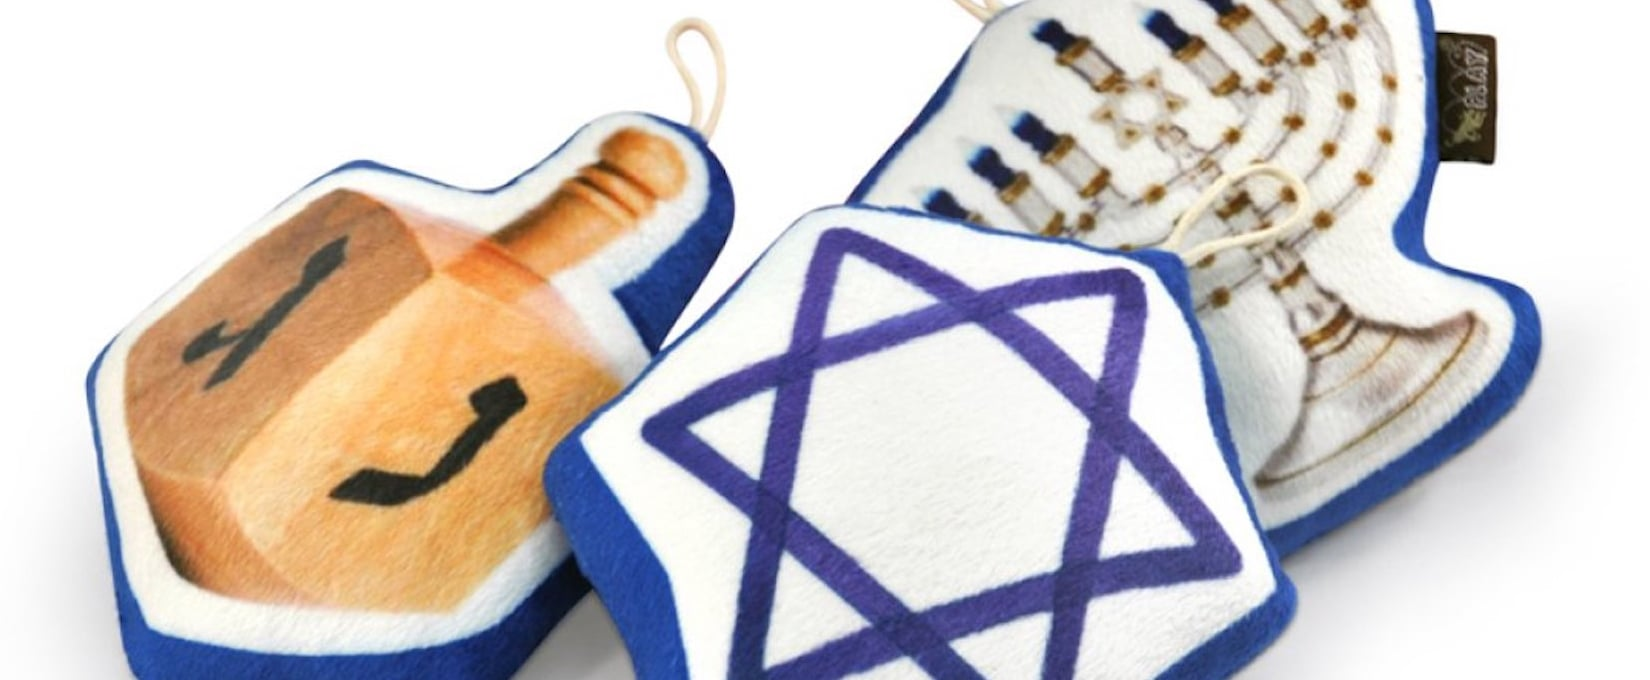 Hanukkah Dog Toys Your Pet Will Love